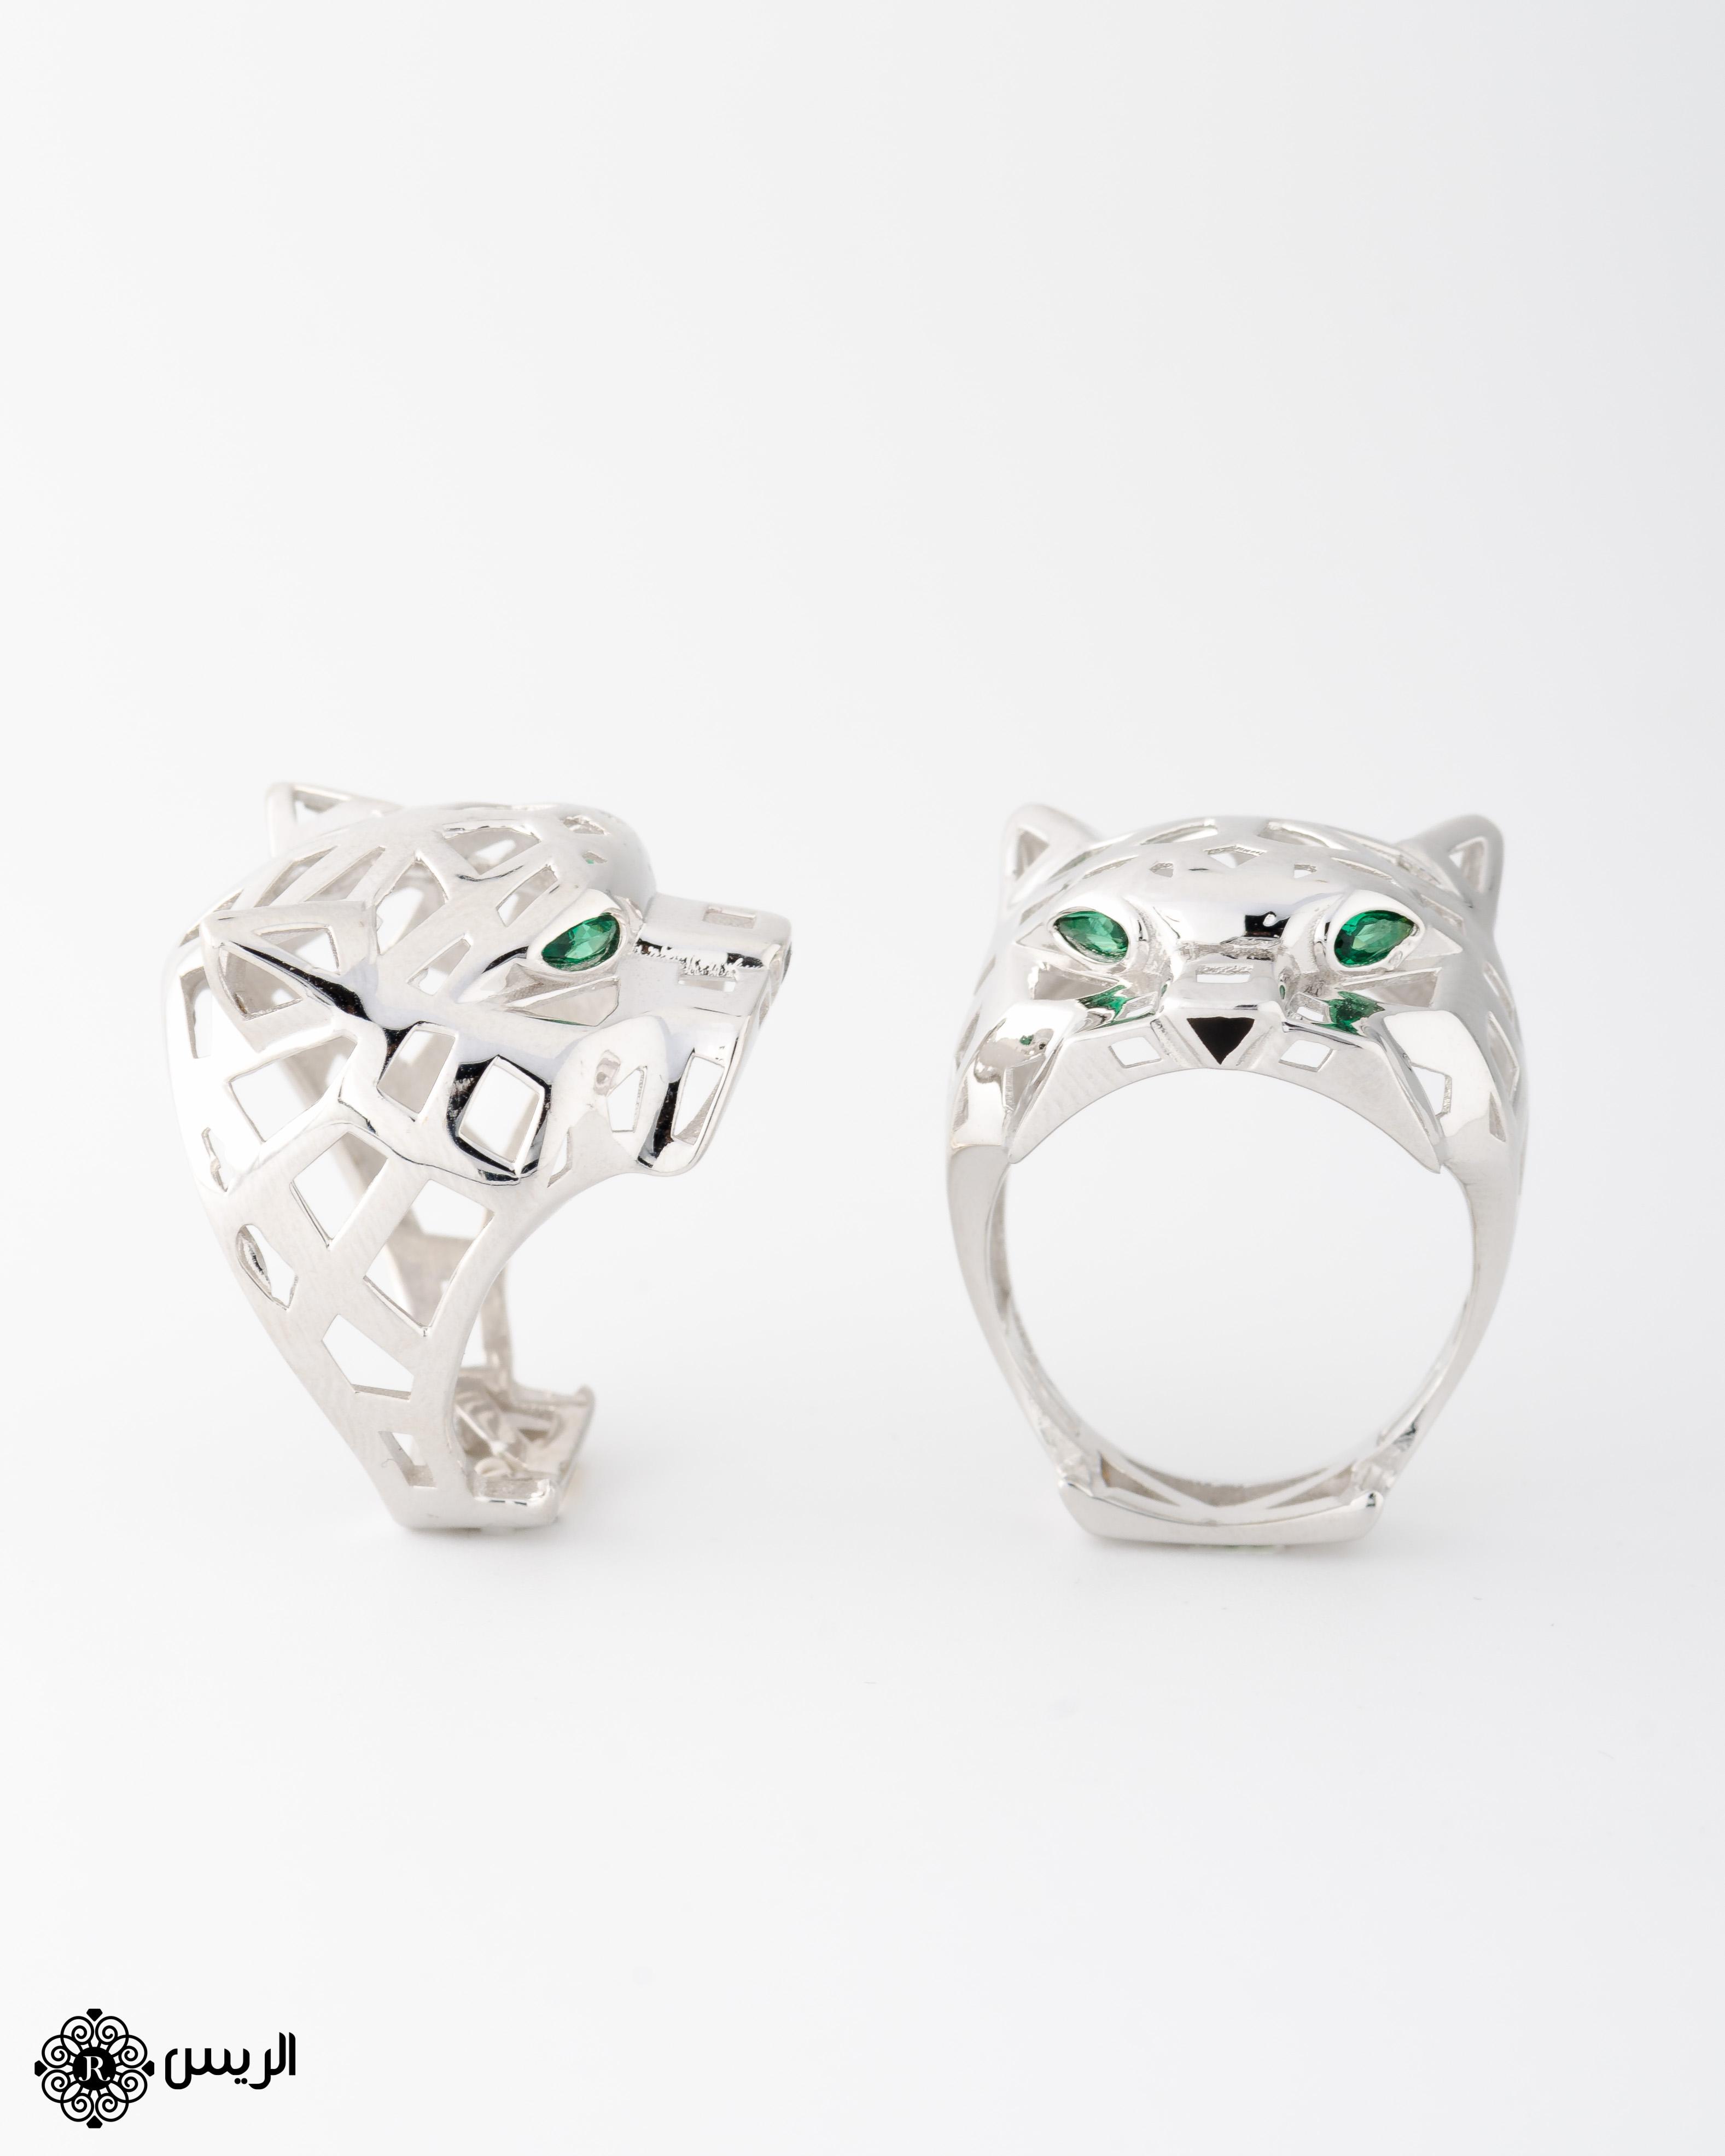 Raies jewelry Tiger Ring خاتم تايجر الريس للمجوهرات